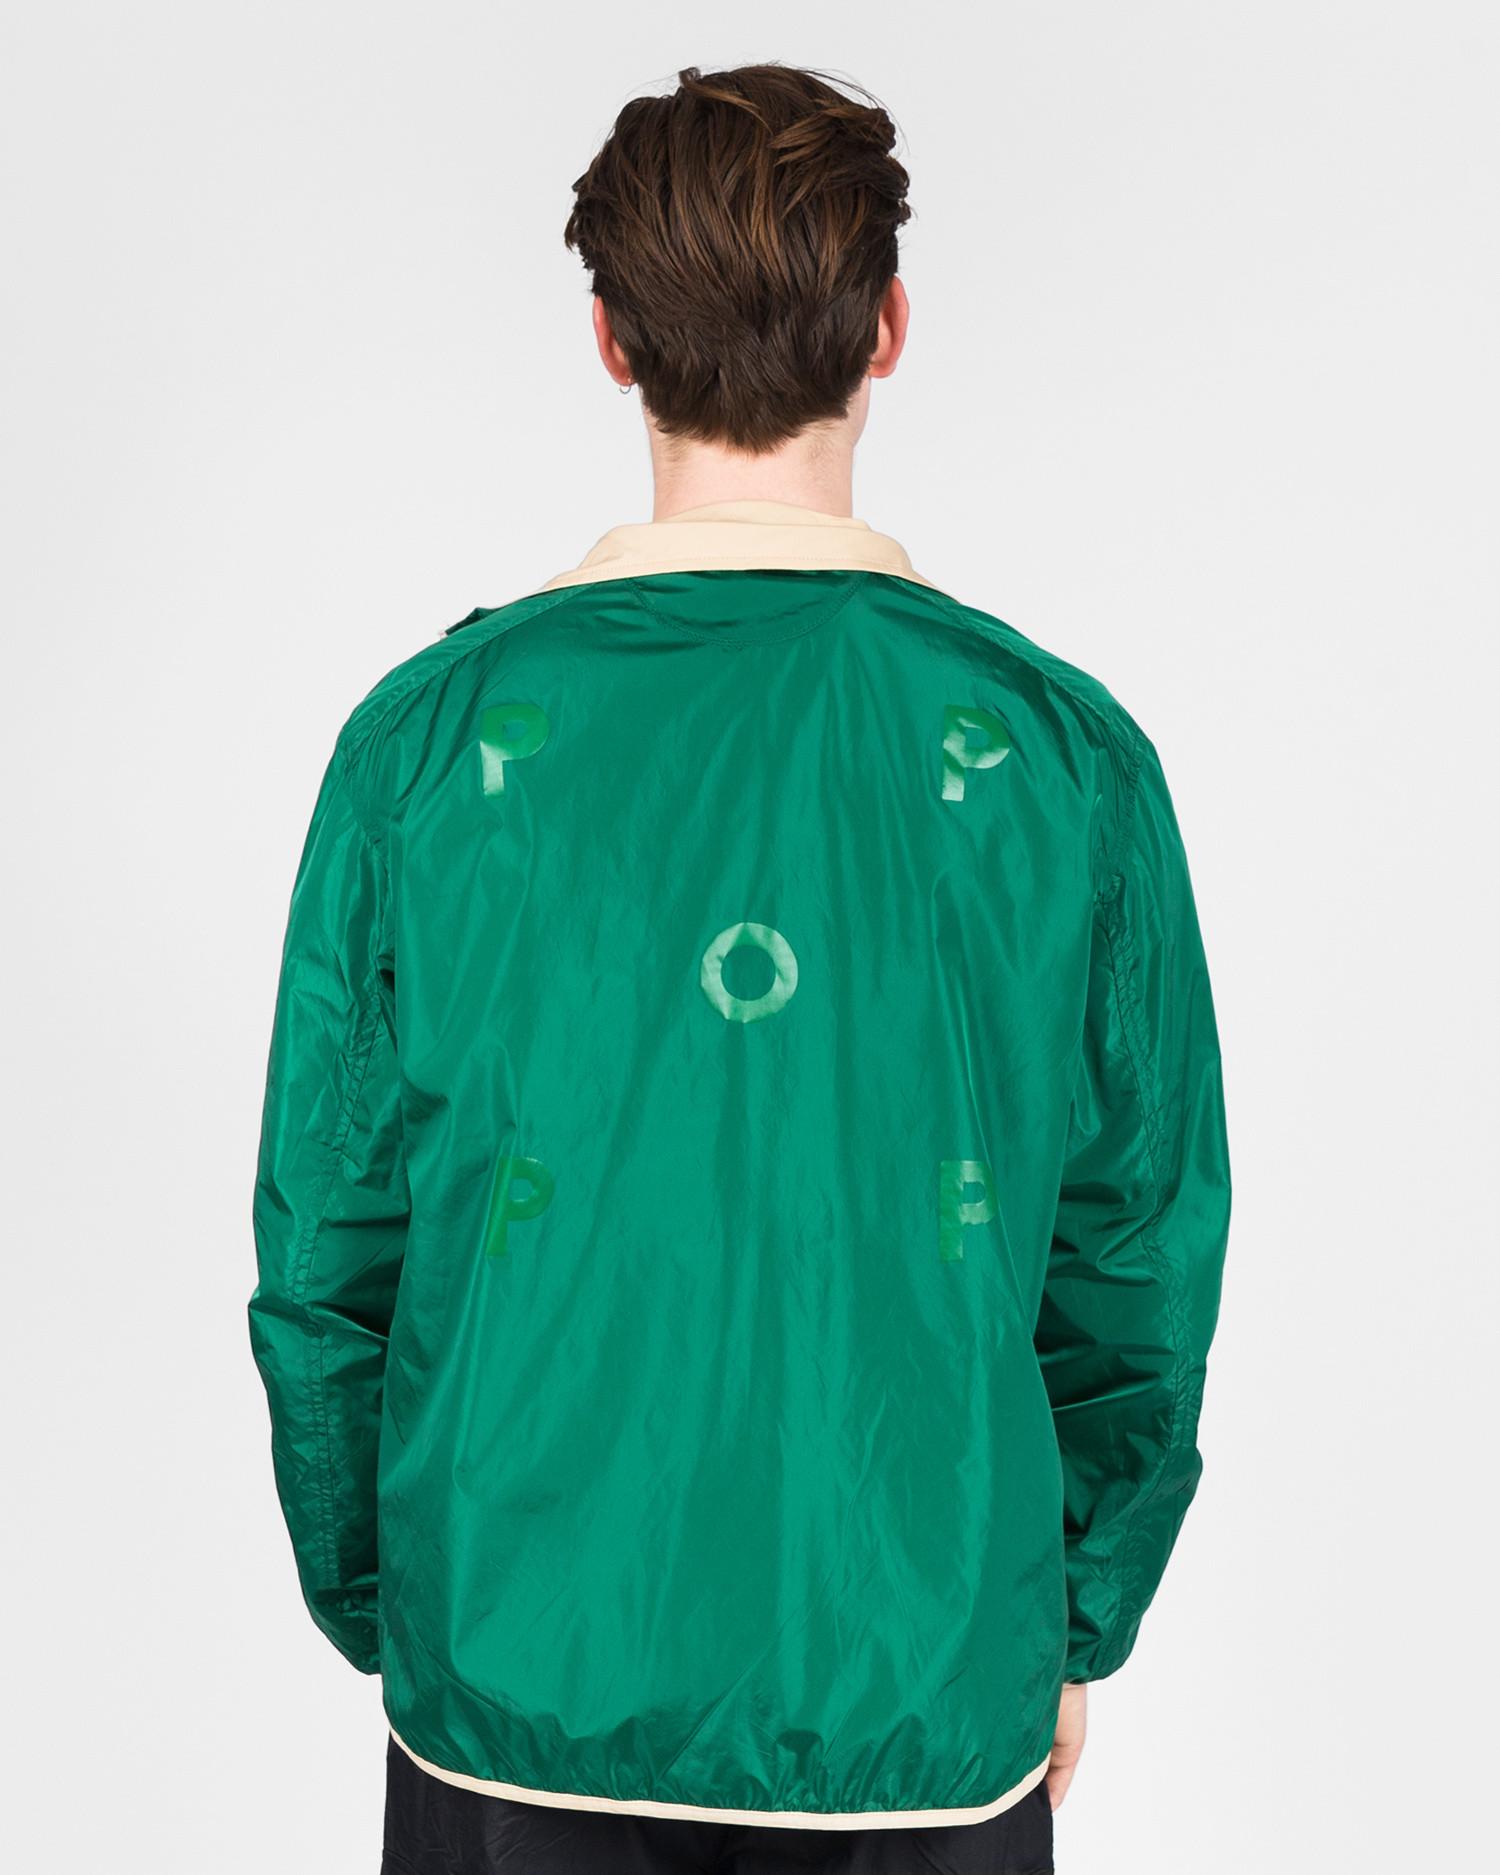 Pop Trading Co plada jacket khaki green